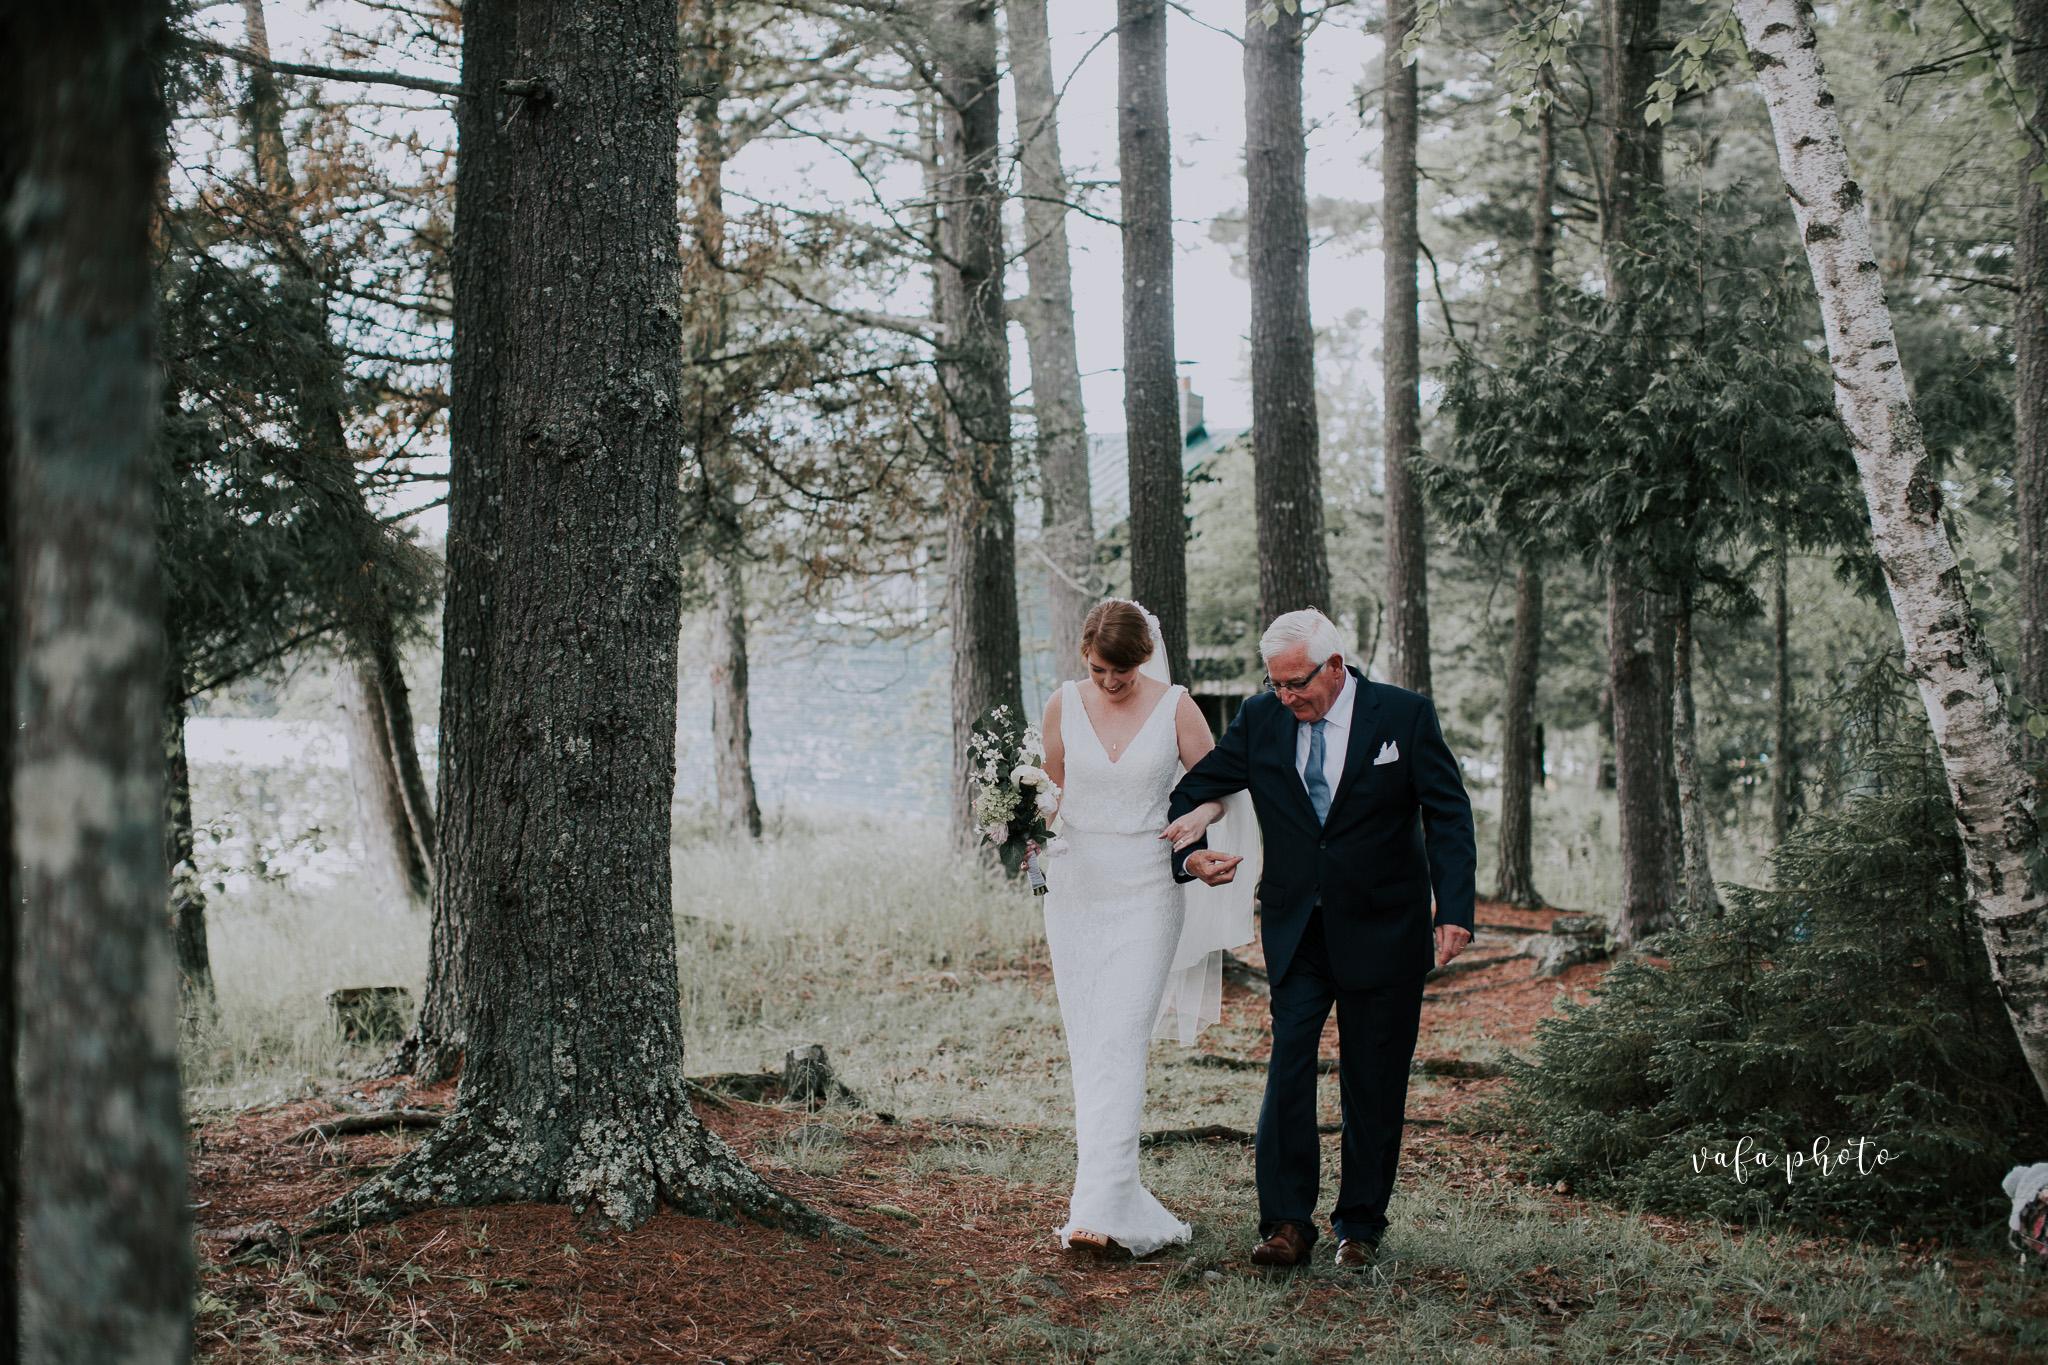 Michigan-Lake-House-Wedding-Madeline-Patrick-Vafa-Photo-285.jpg